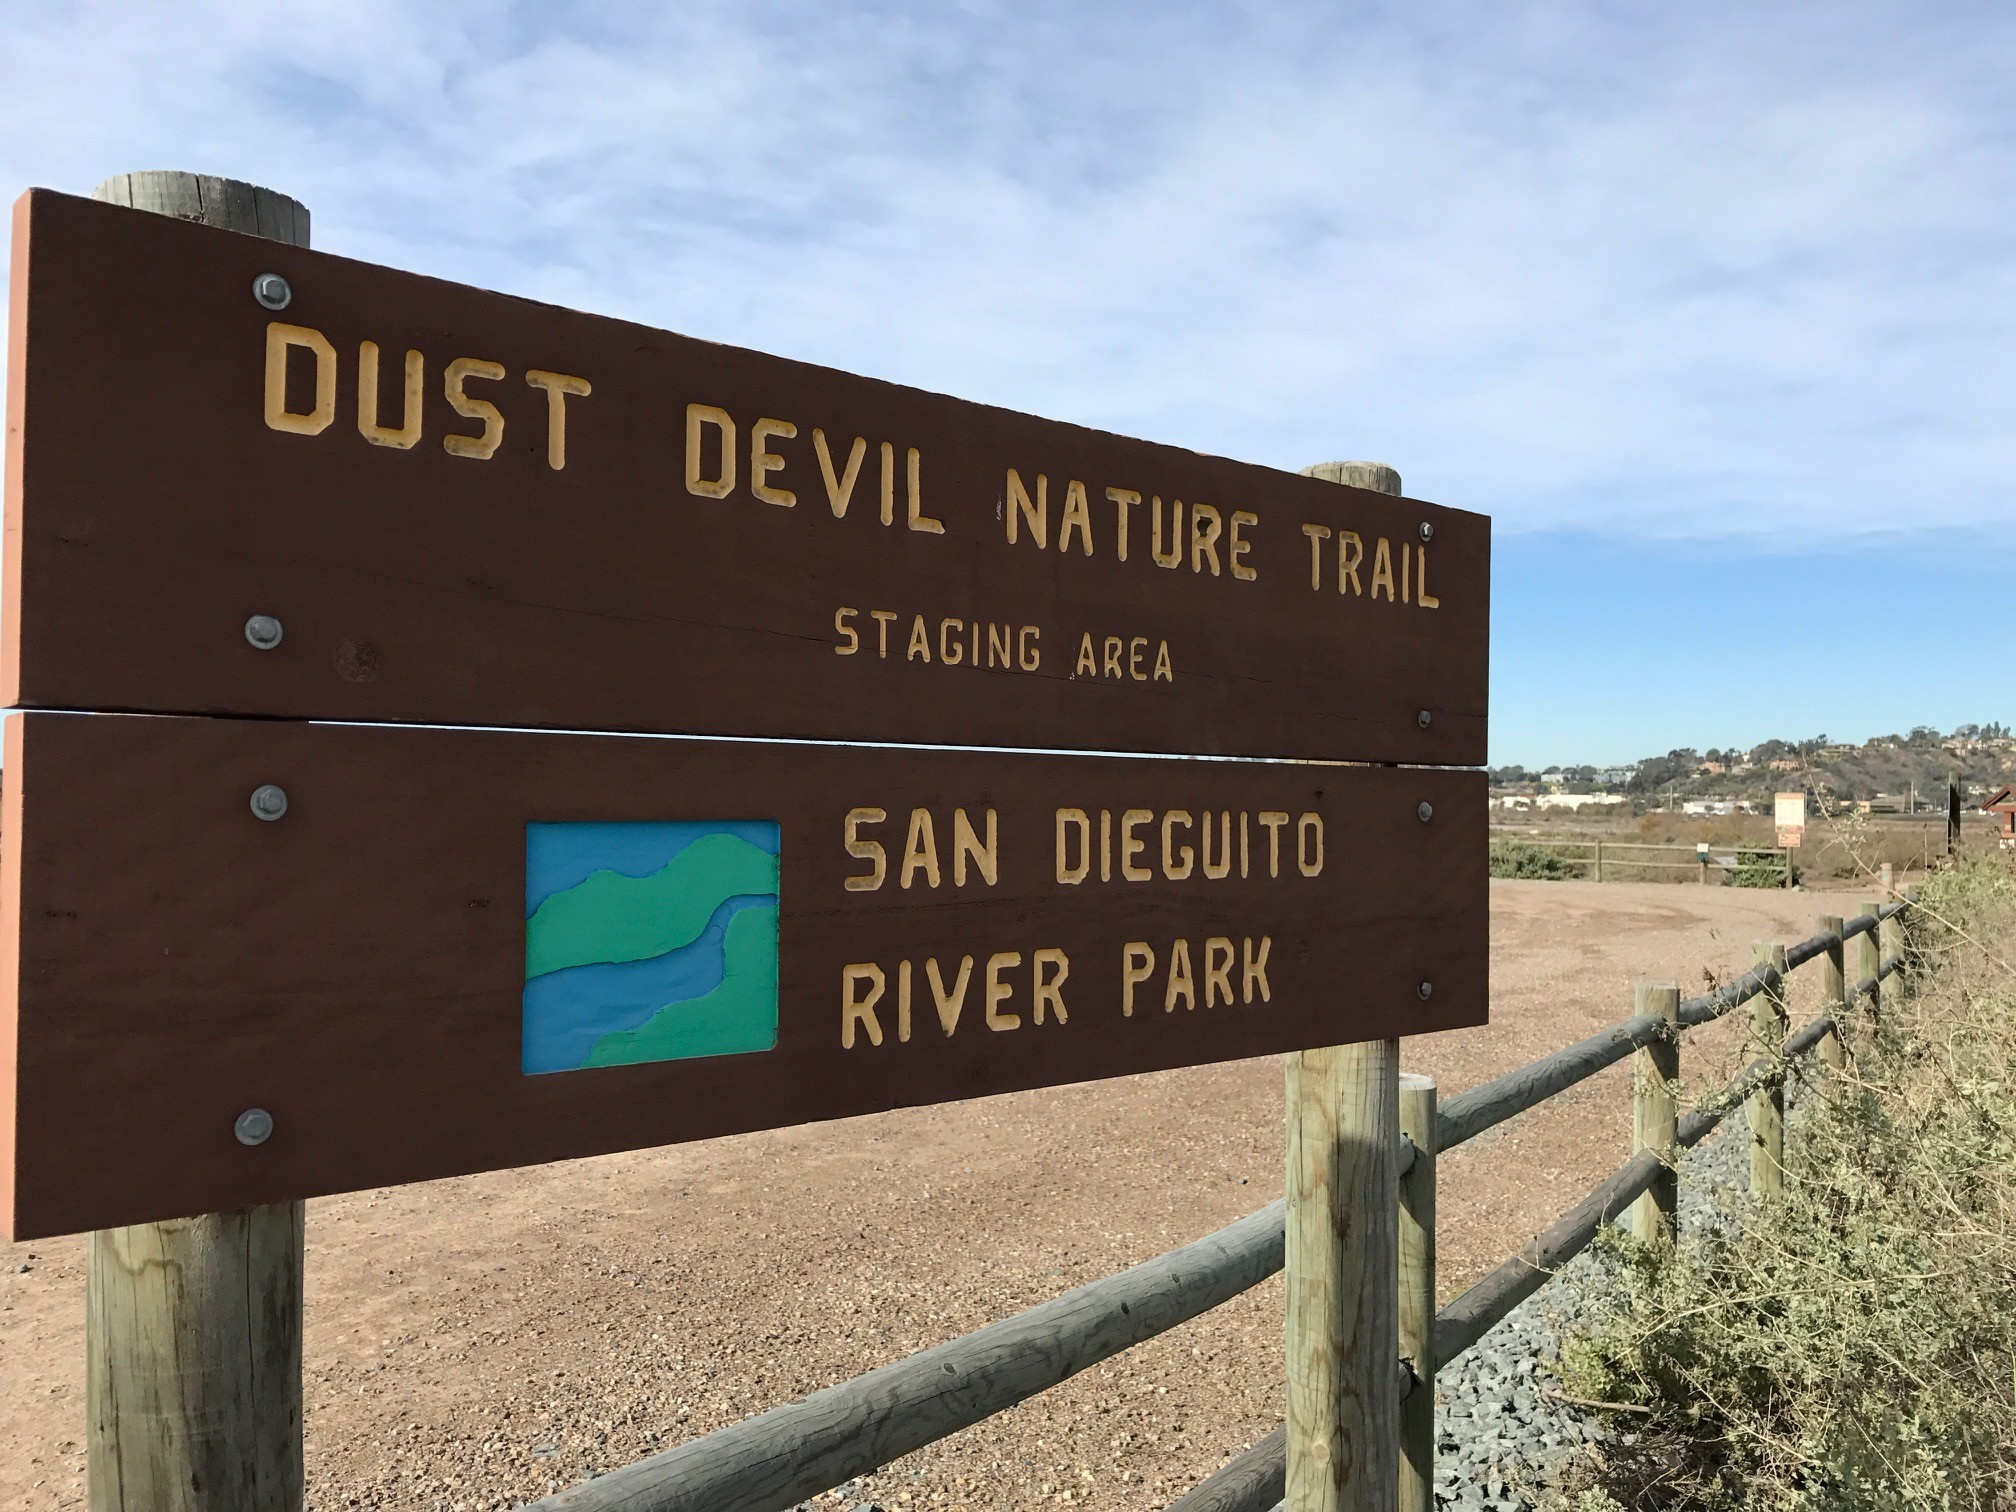 The Dust Devil trailhead on El Camino Real.